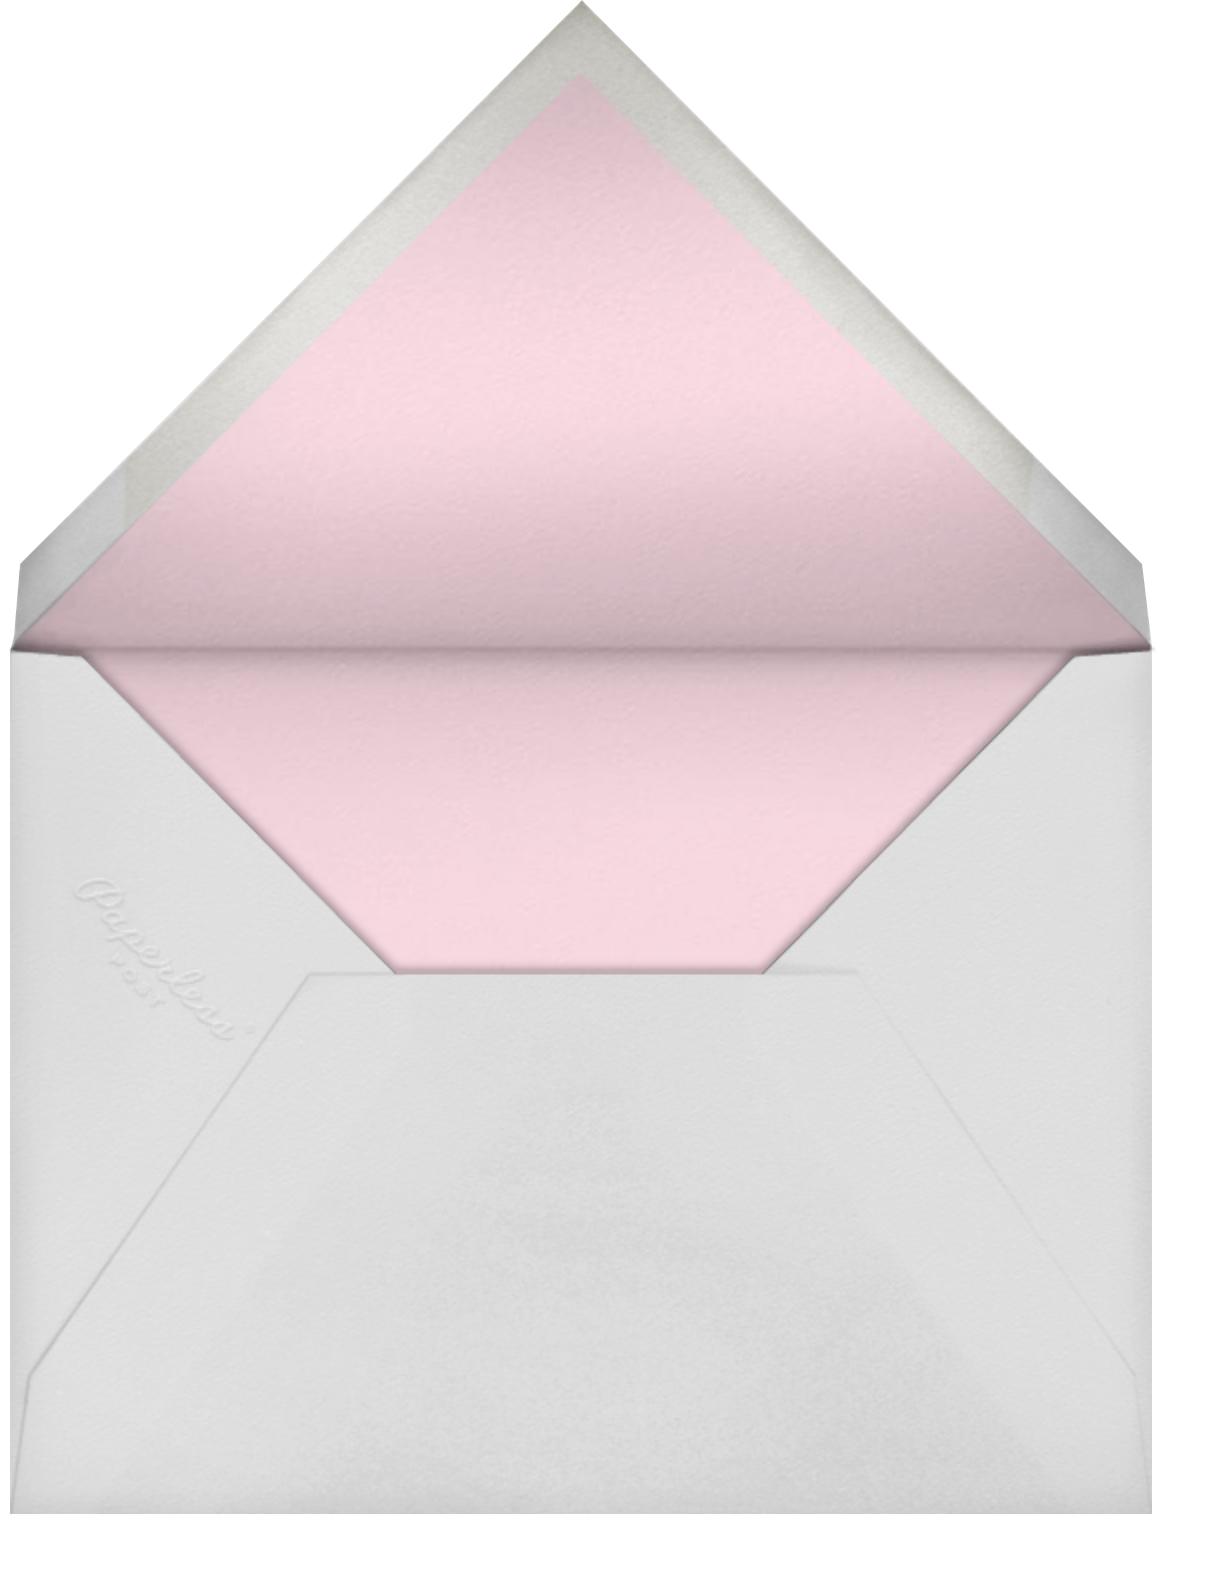 Thayer - Crane & Co. - Engagement party - envelope back